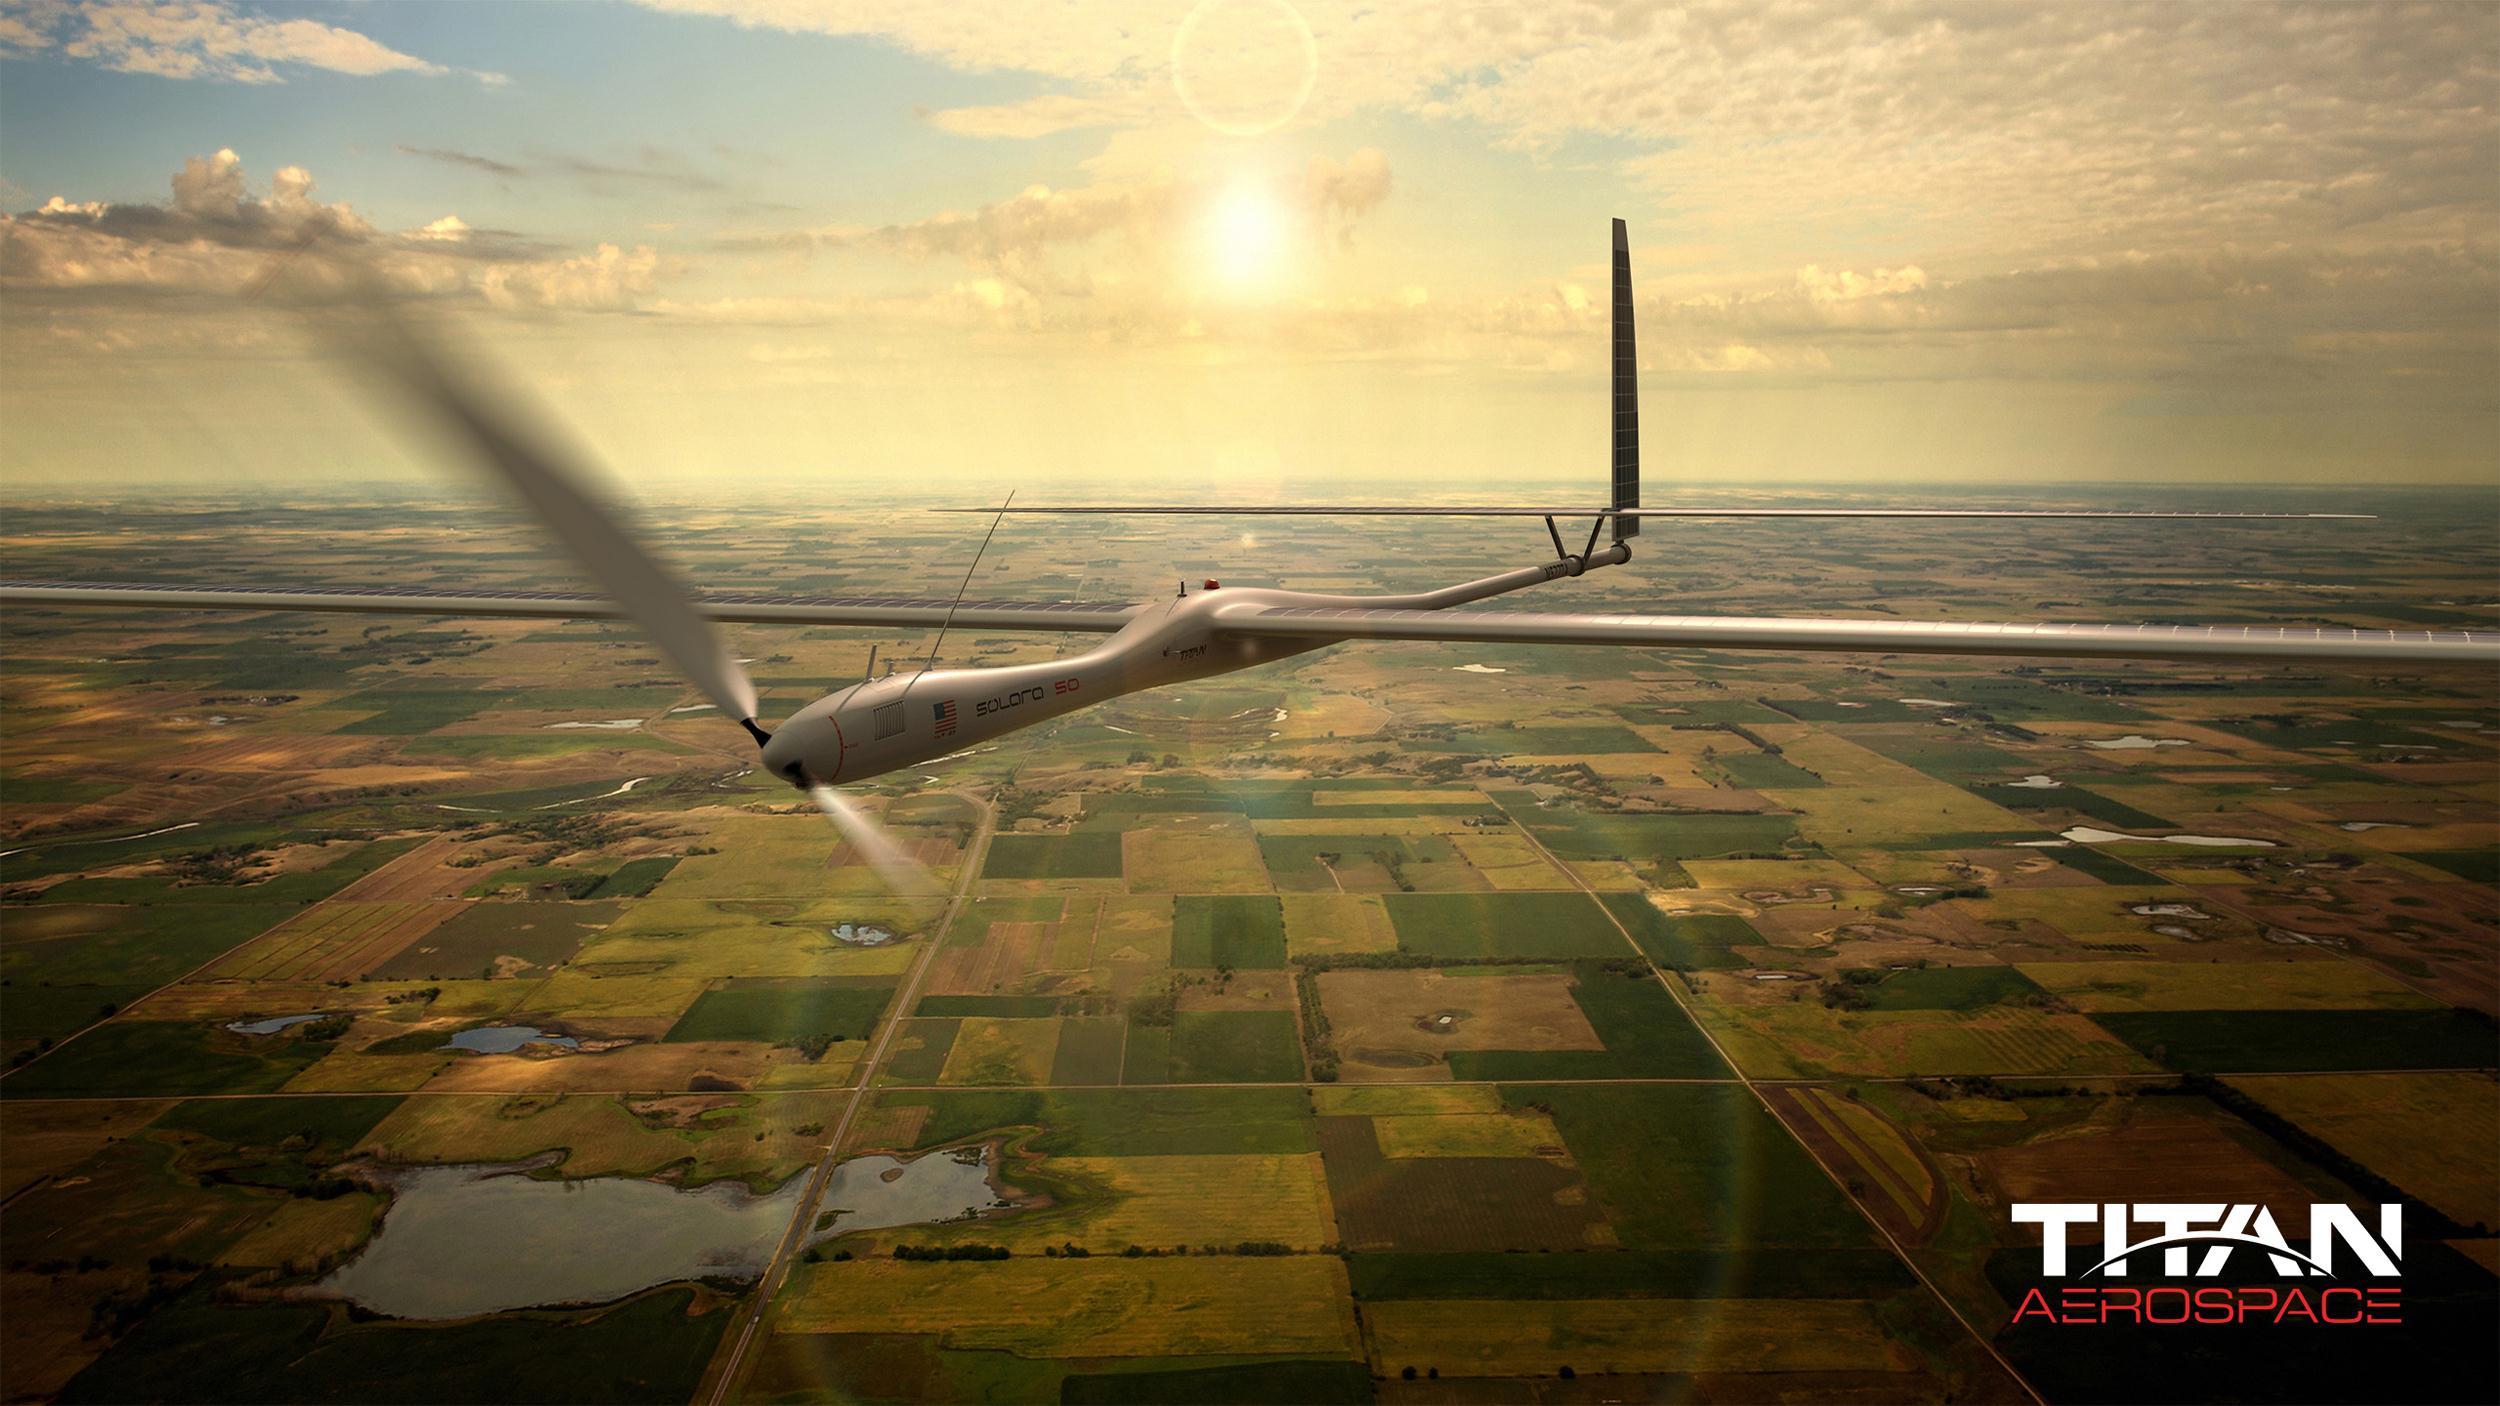 Facebook to Buy Drone Company Titan Aerospace for $60 Million